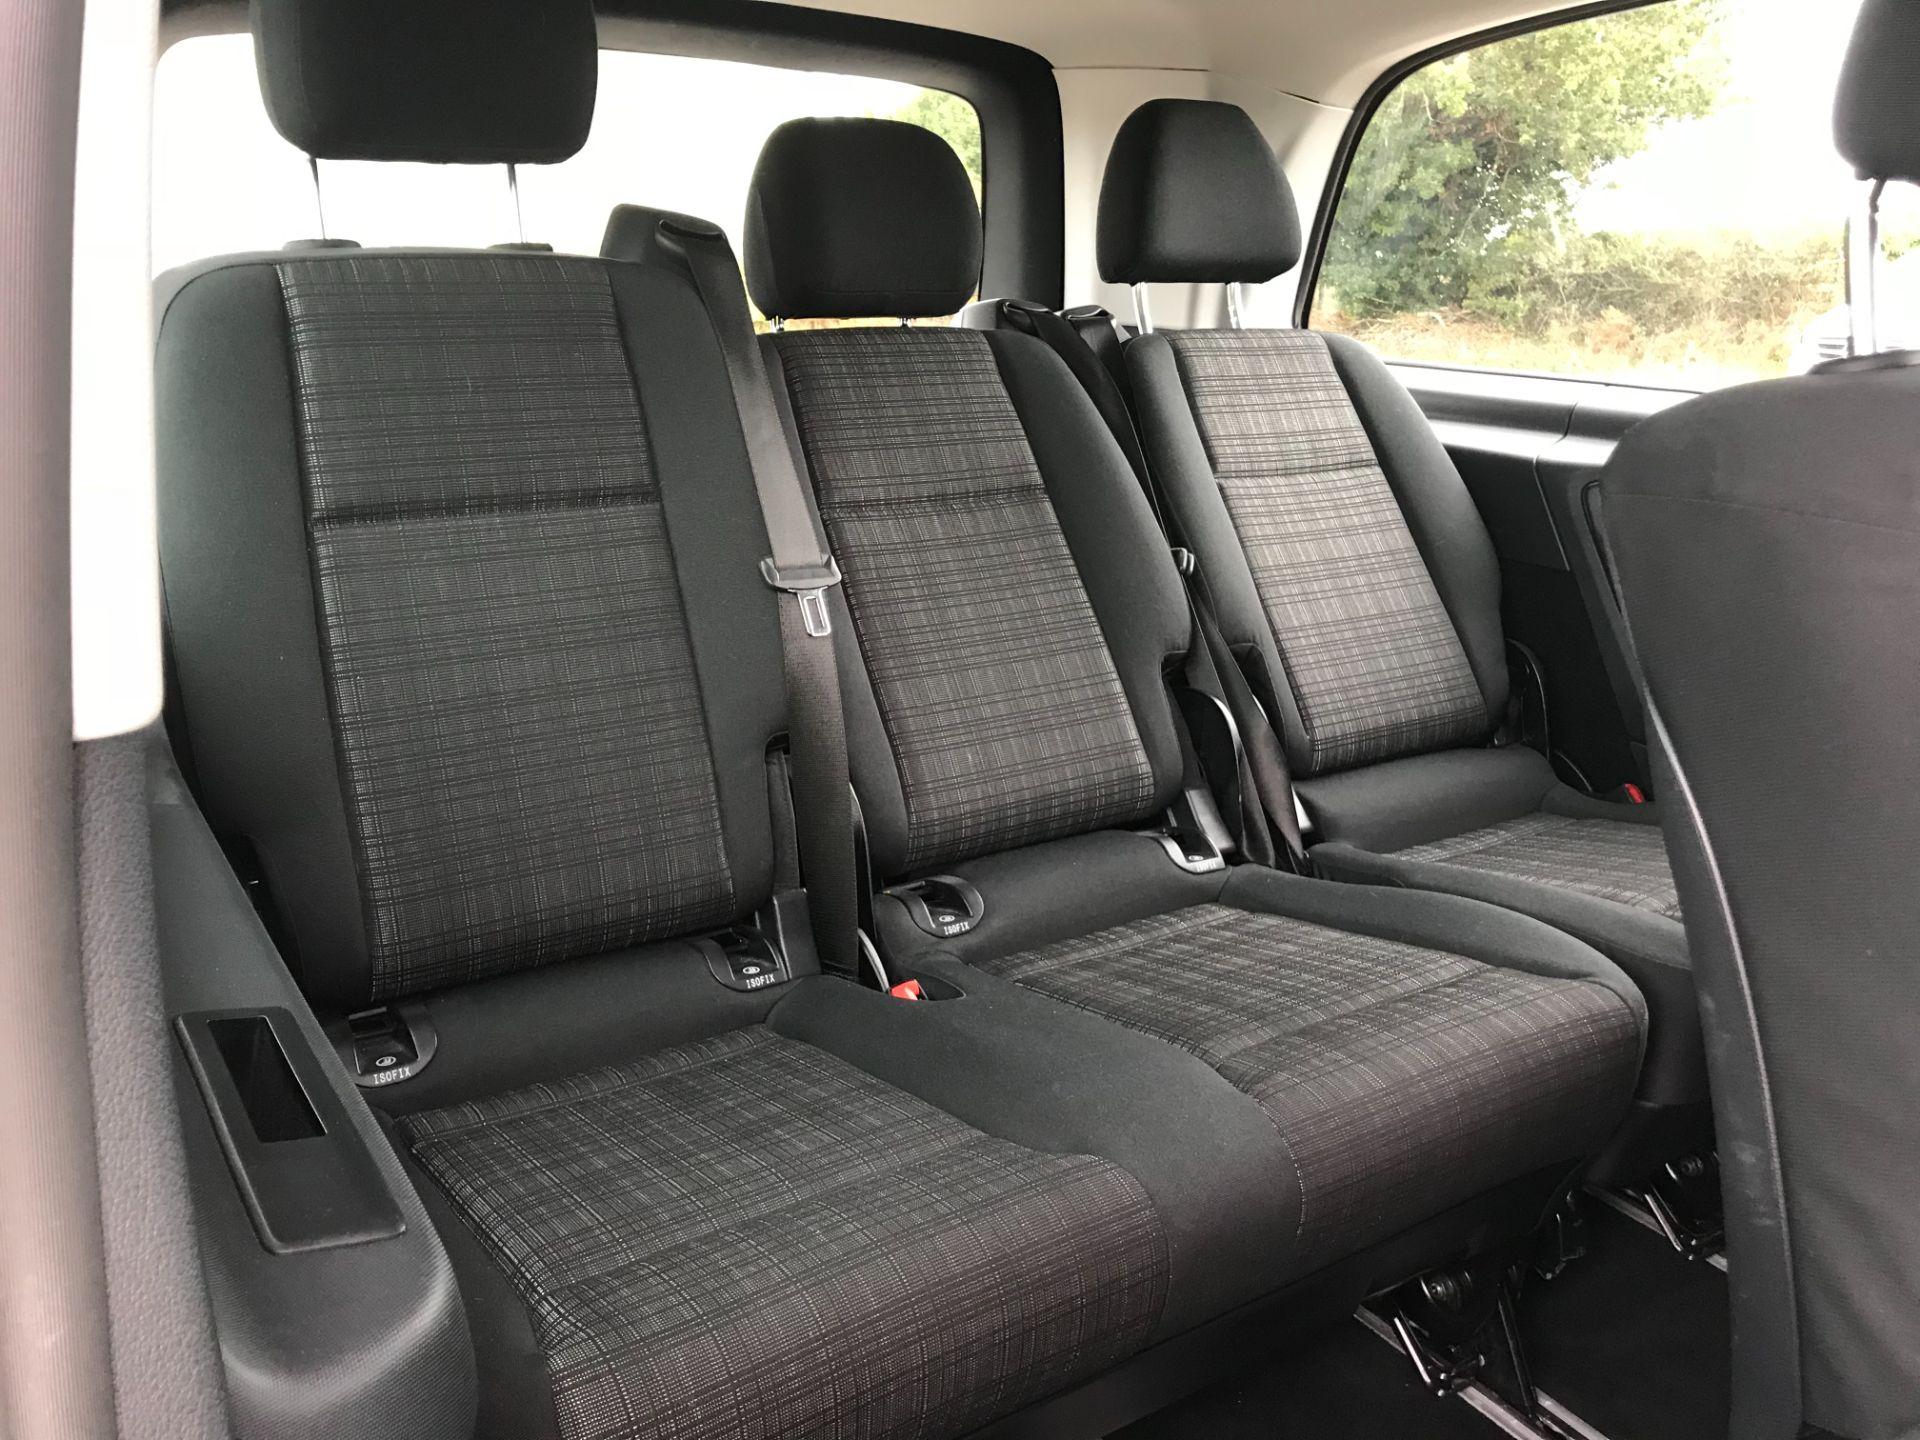 2019 Mercedes-Benz Vito 119 Cdi Select 8-Seater 7G-Tronic (KR19XWU) Image 12